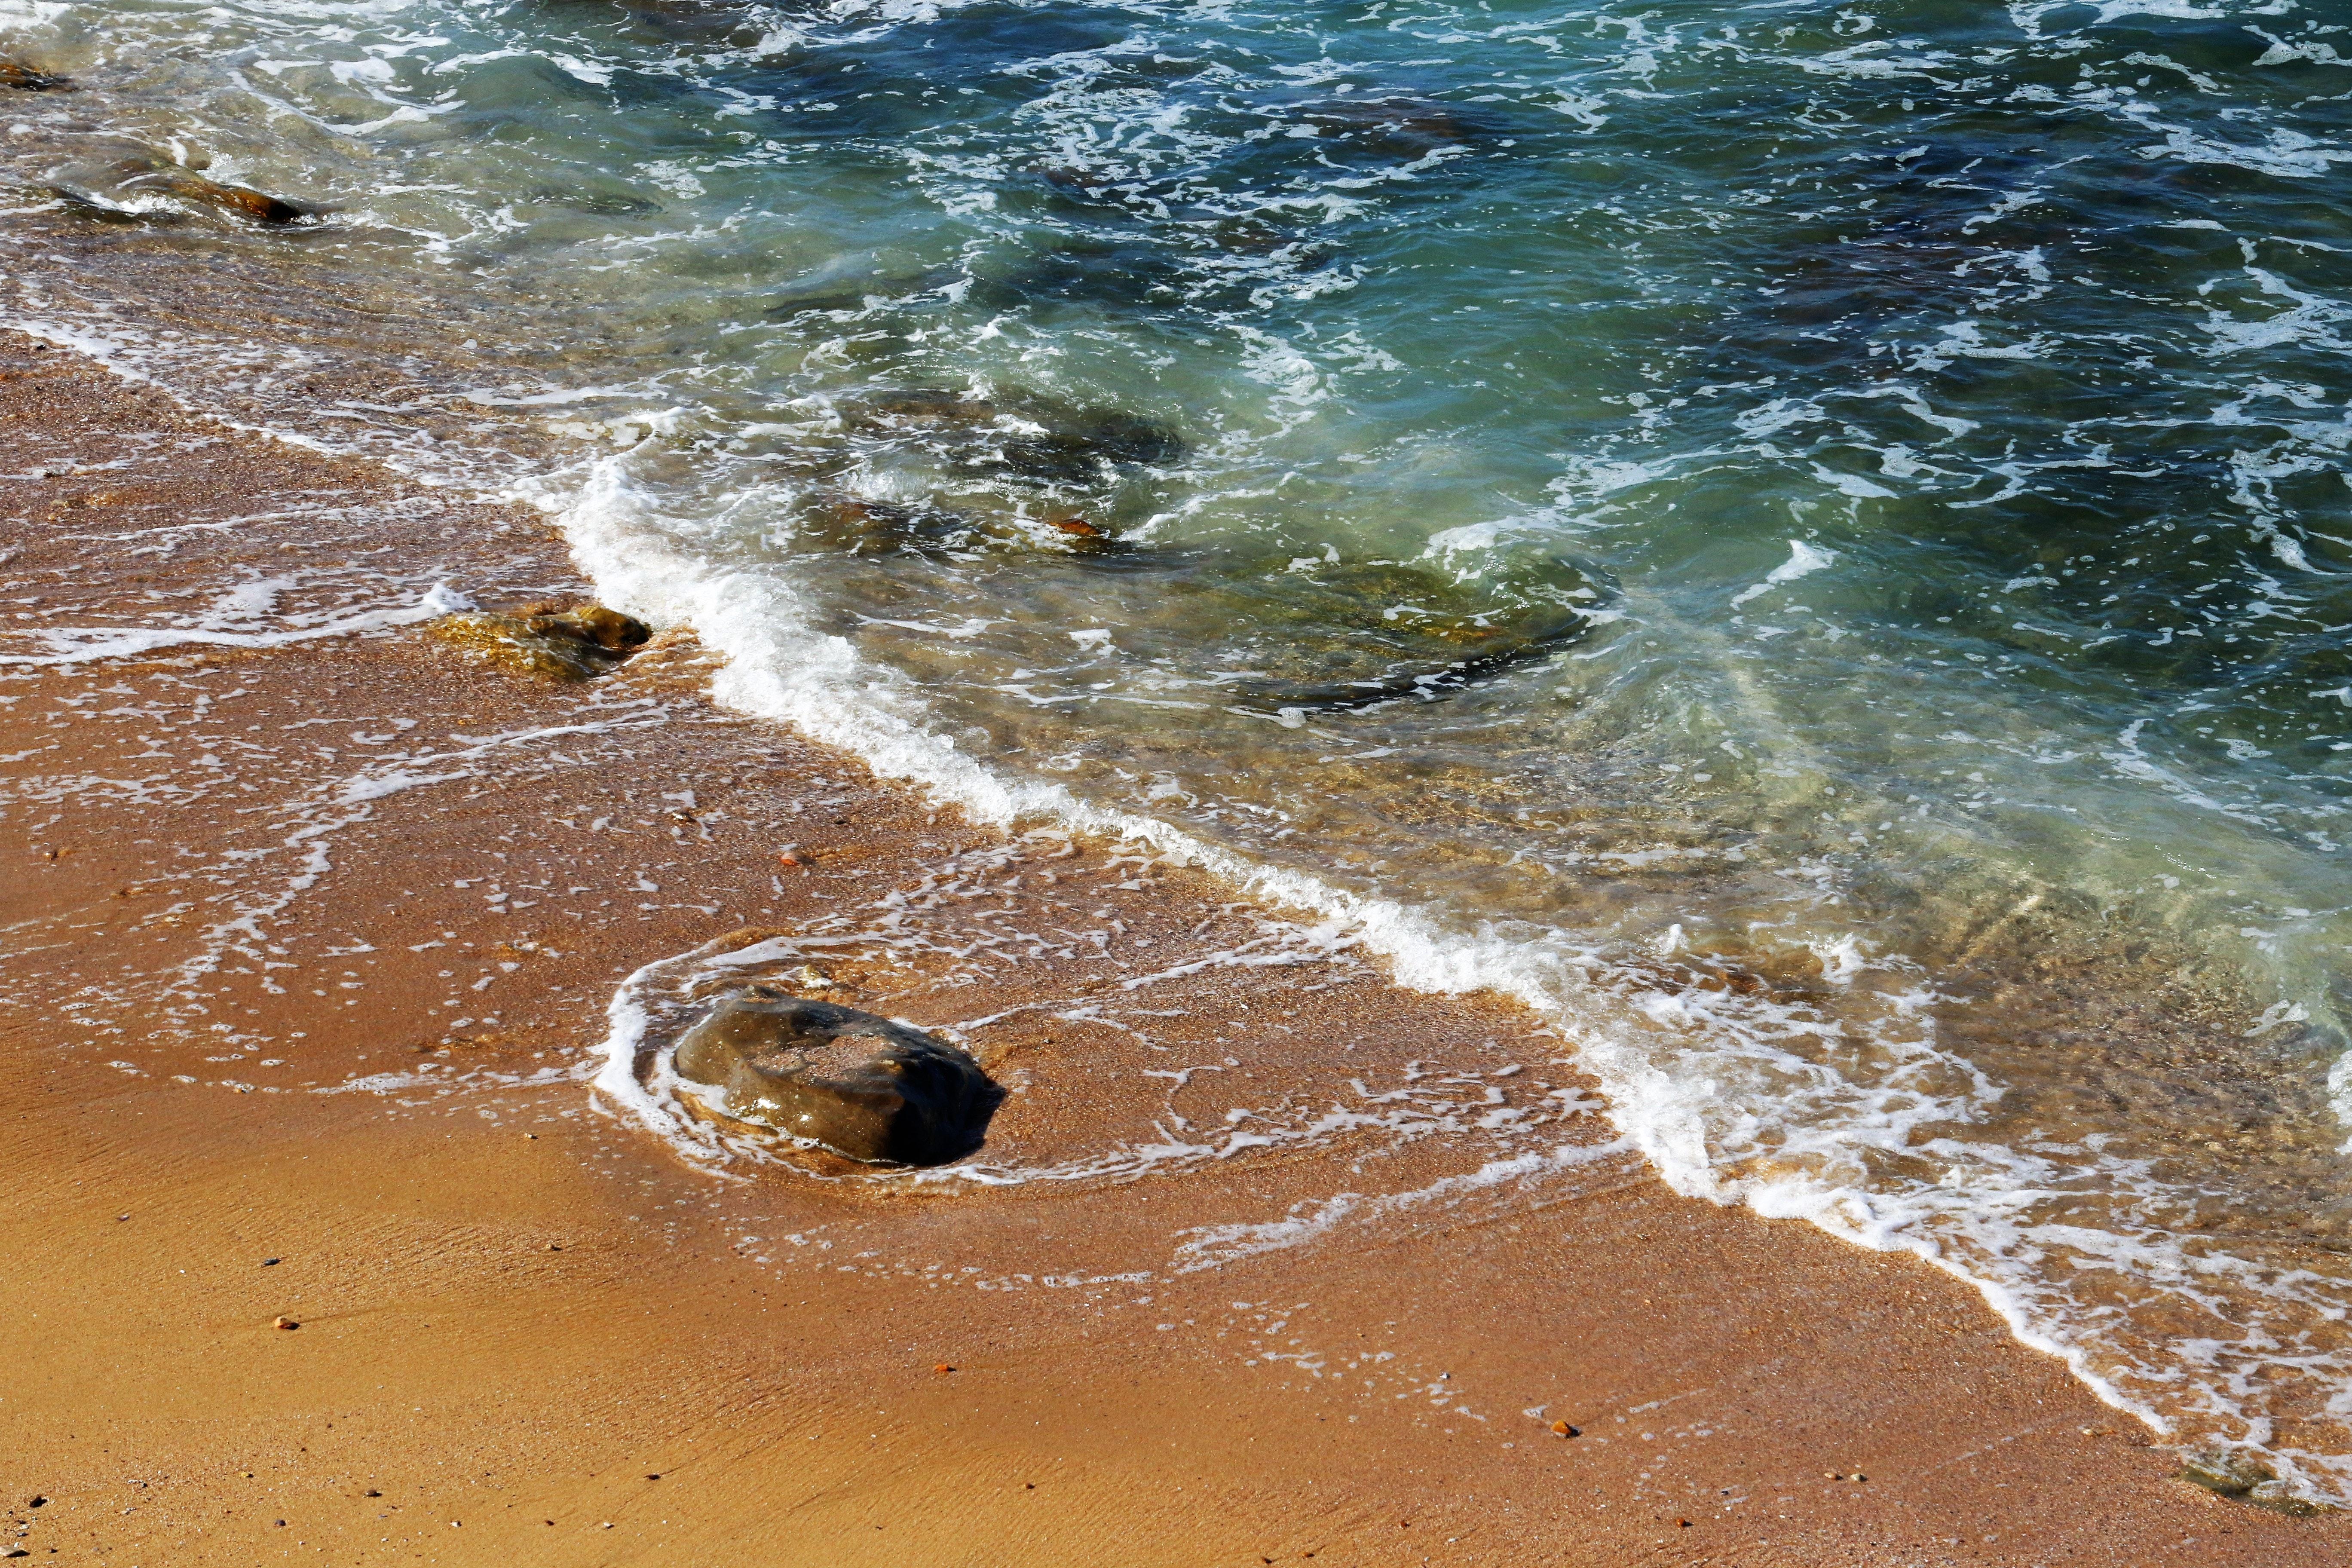 Foto De Lapso De Tempo Da Onda Do Mar · Foto profissional gratuita